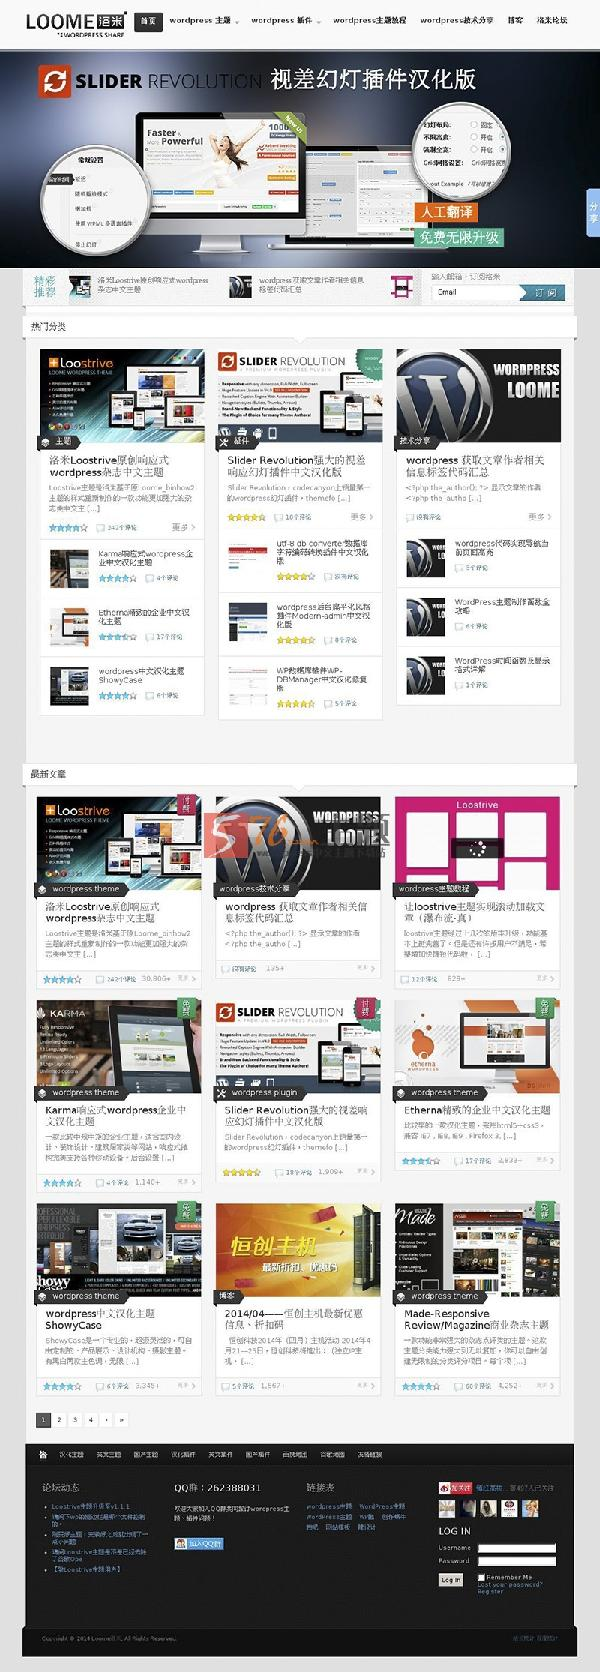 wordpress主题:Made-Magazine汉化修改版 原洛米自用主题